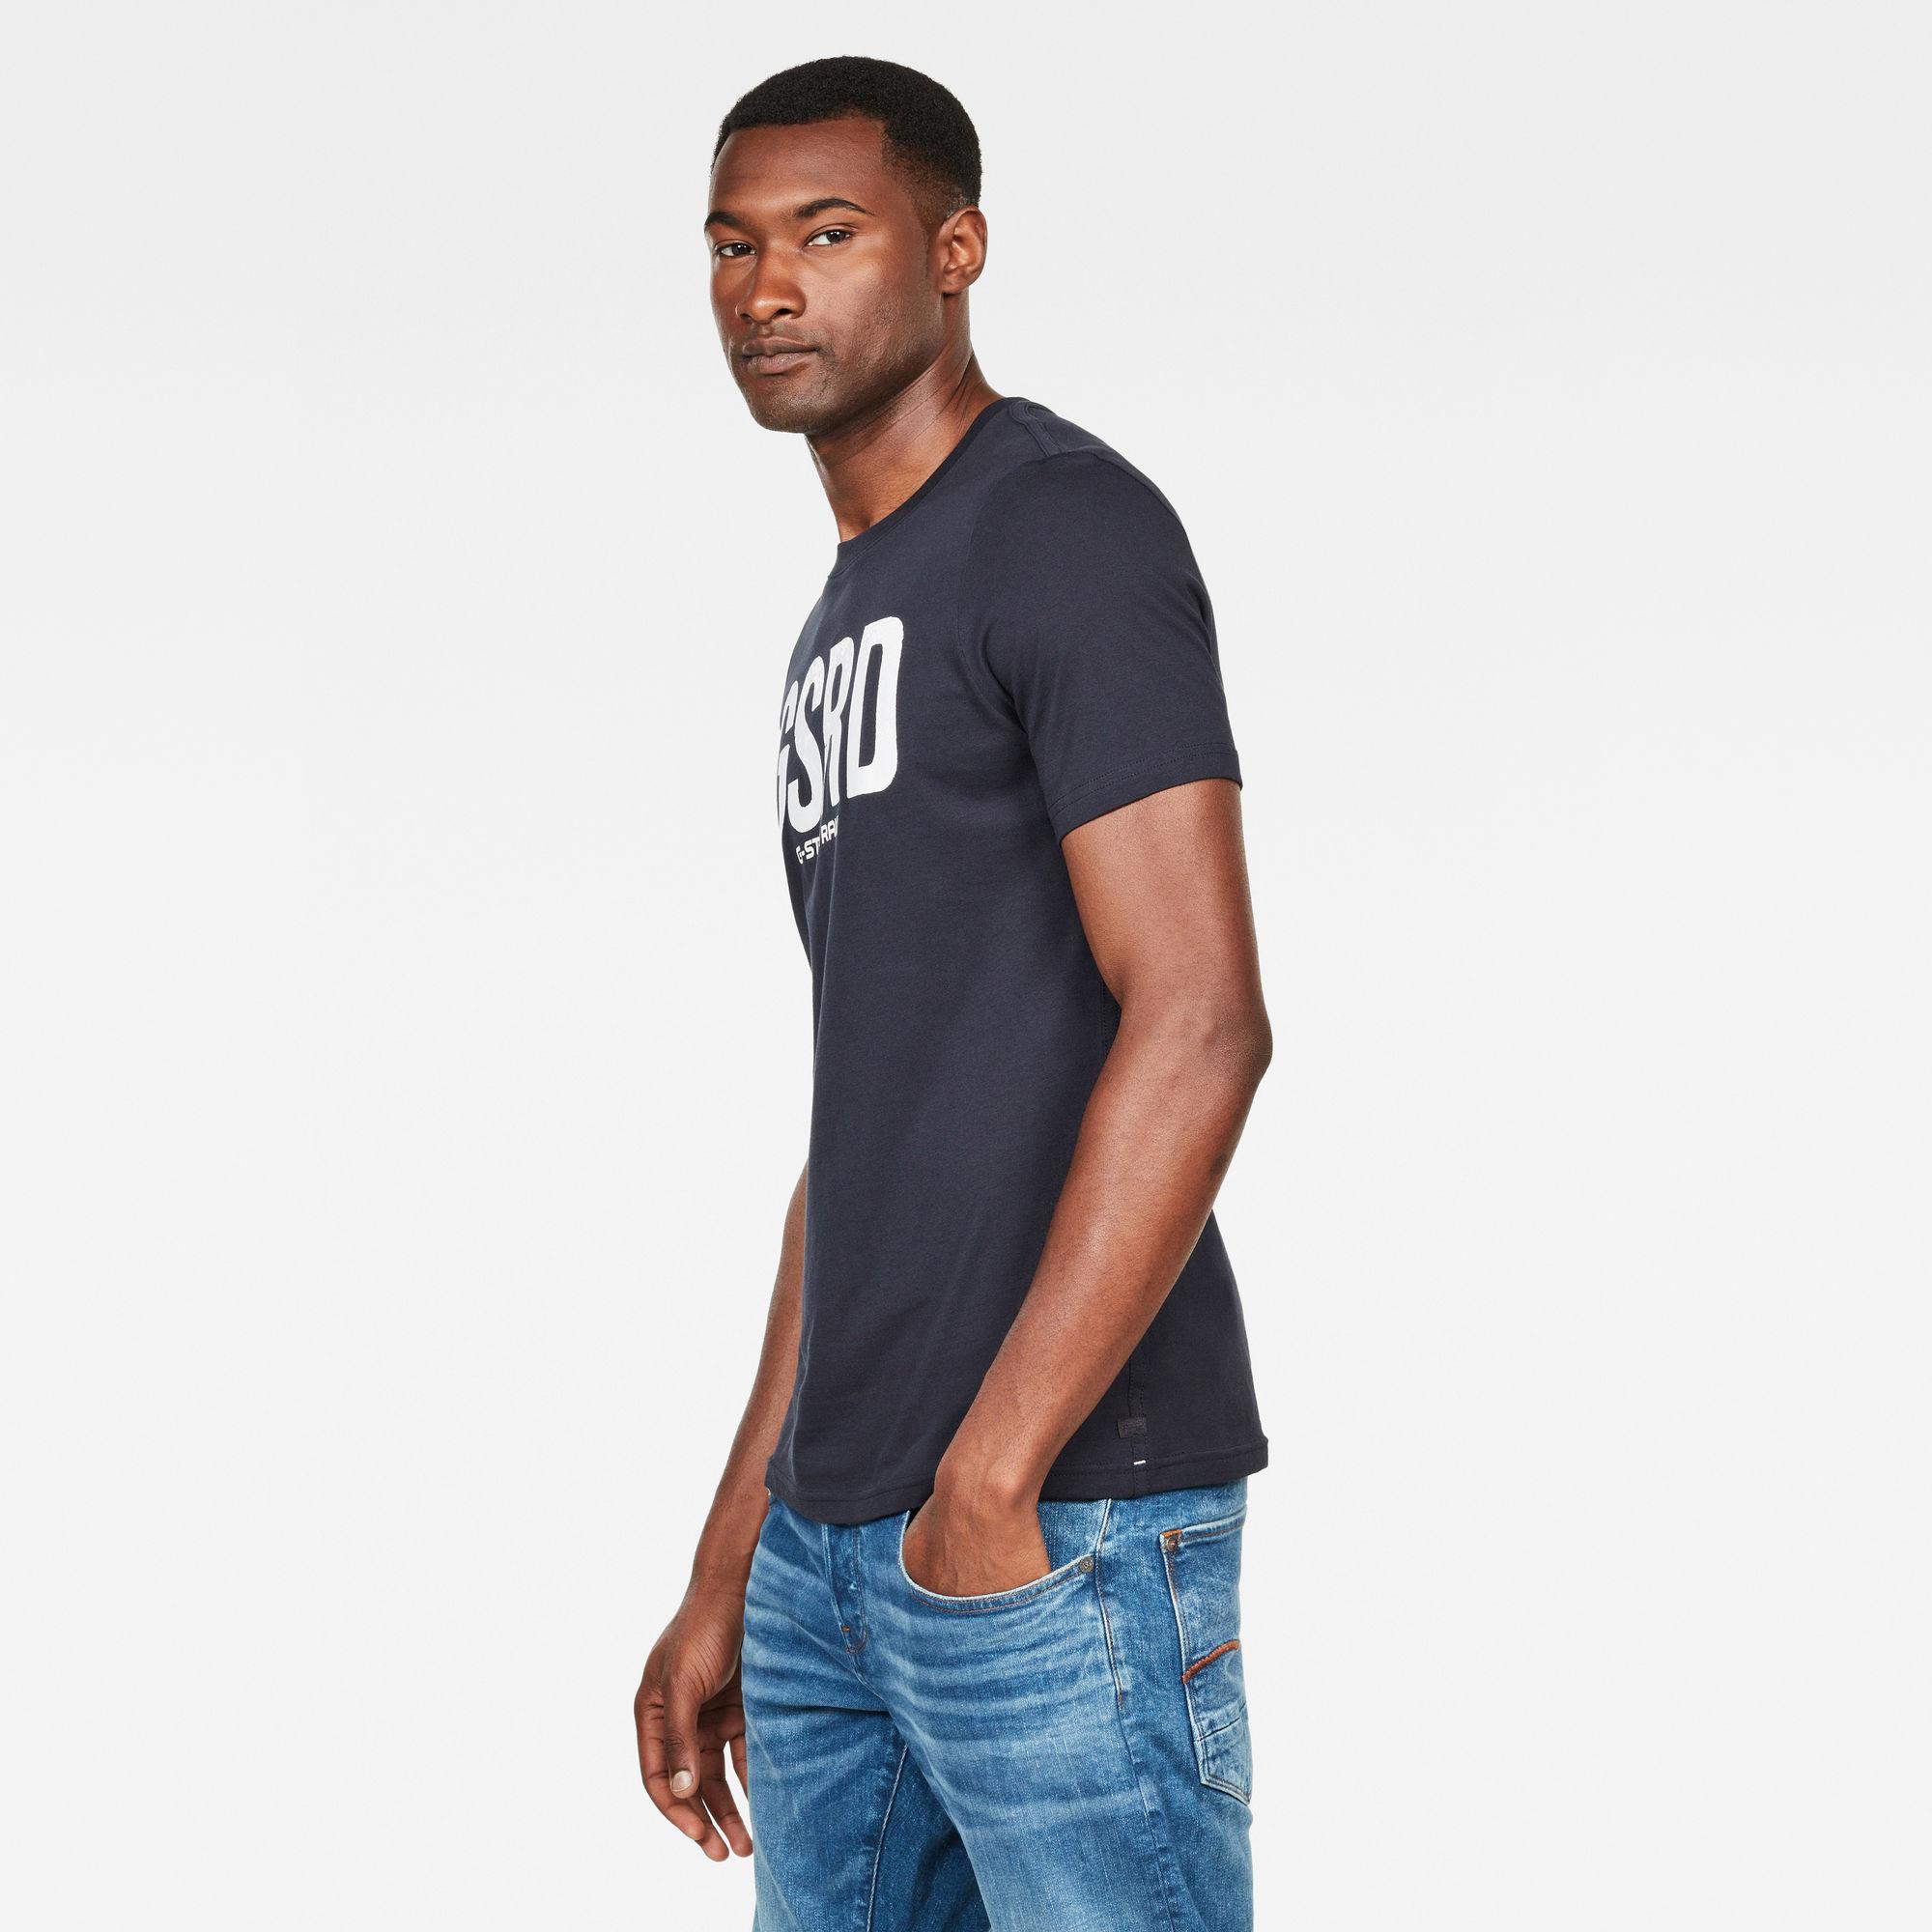 G-Star RAW Graphic 5 Slim T-Shirt